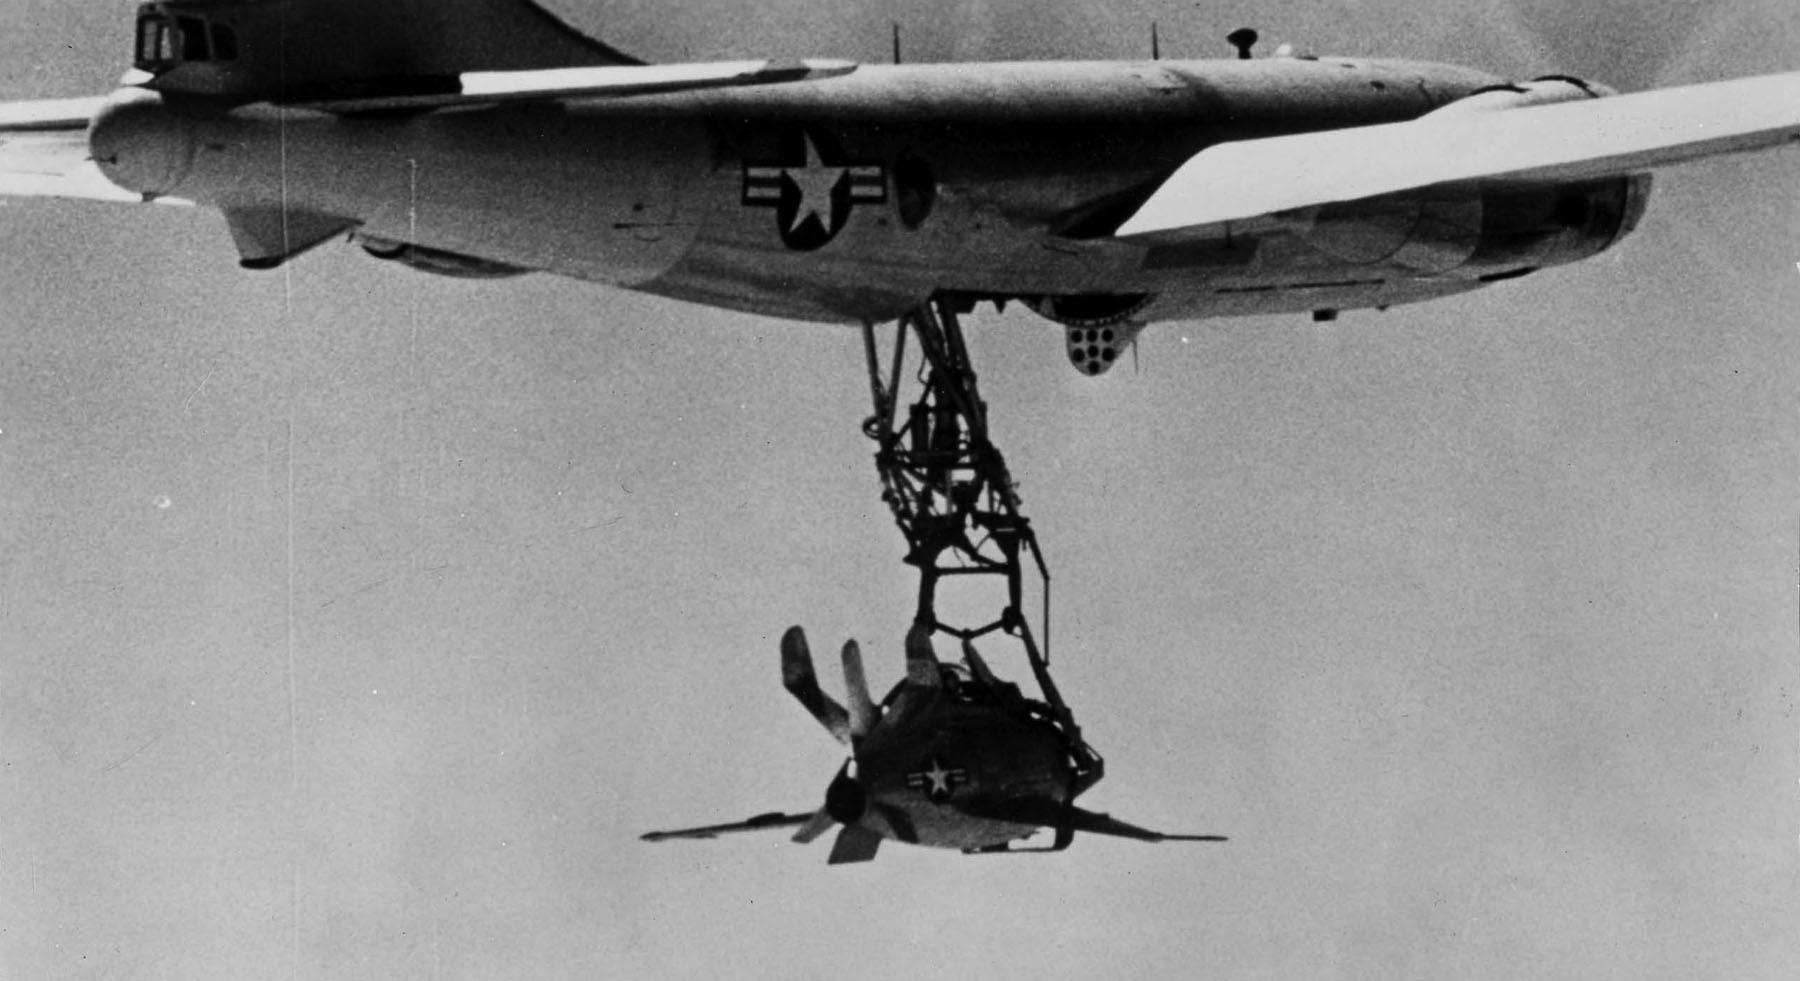 XF-85 Goblin na trapezie pod kadłubem EB-29 (fot. US Air Force)